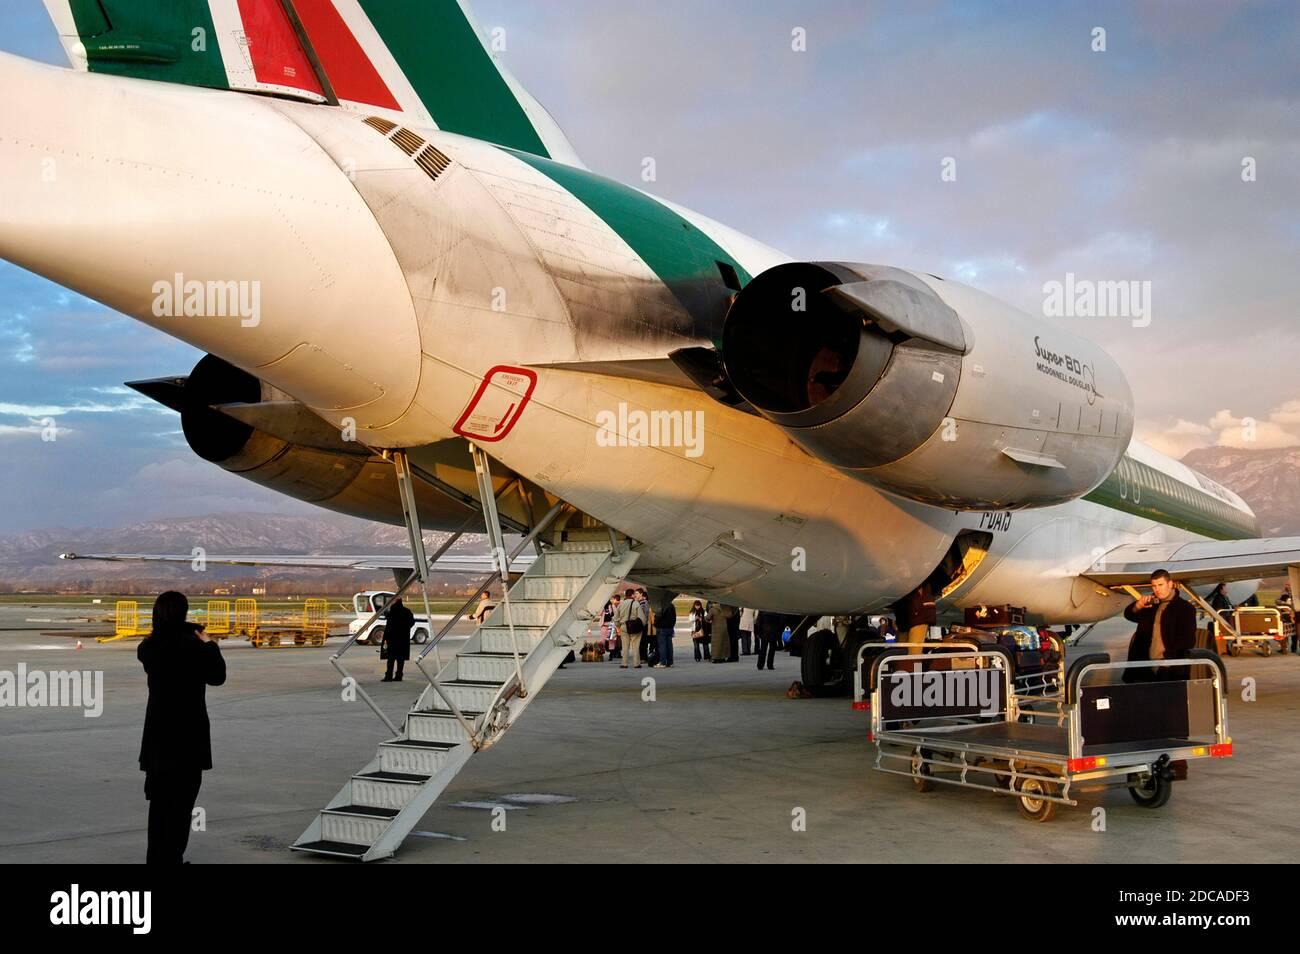 Déchargement d'un vol Alitalia à l'aéroport mère Theresa de Tirana, Albanie Banque D'Images